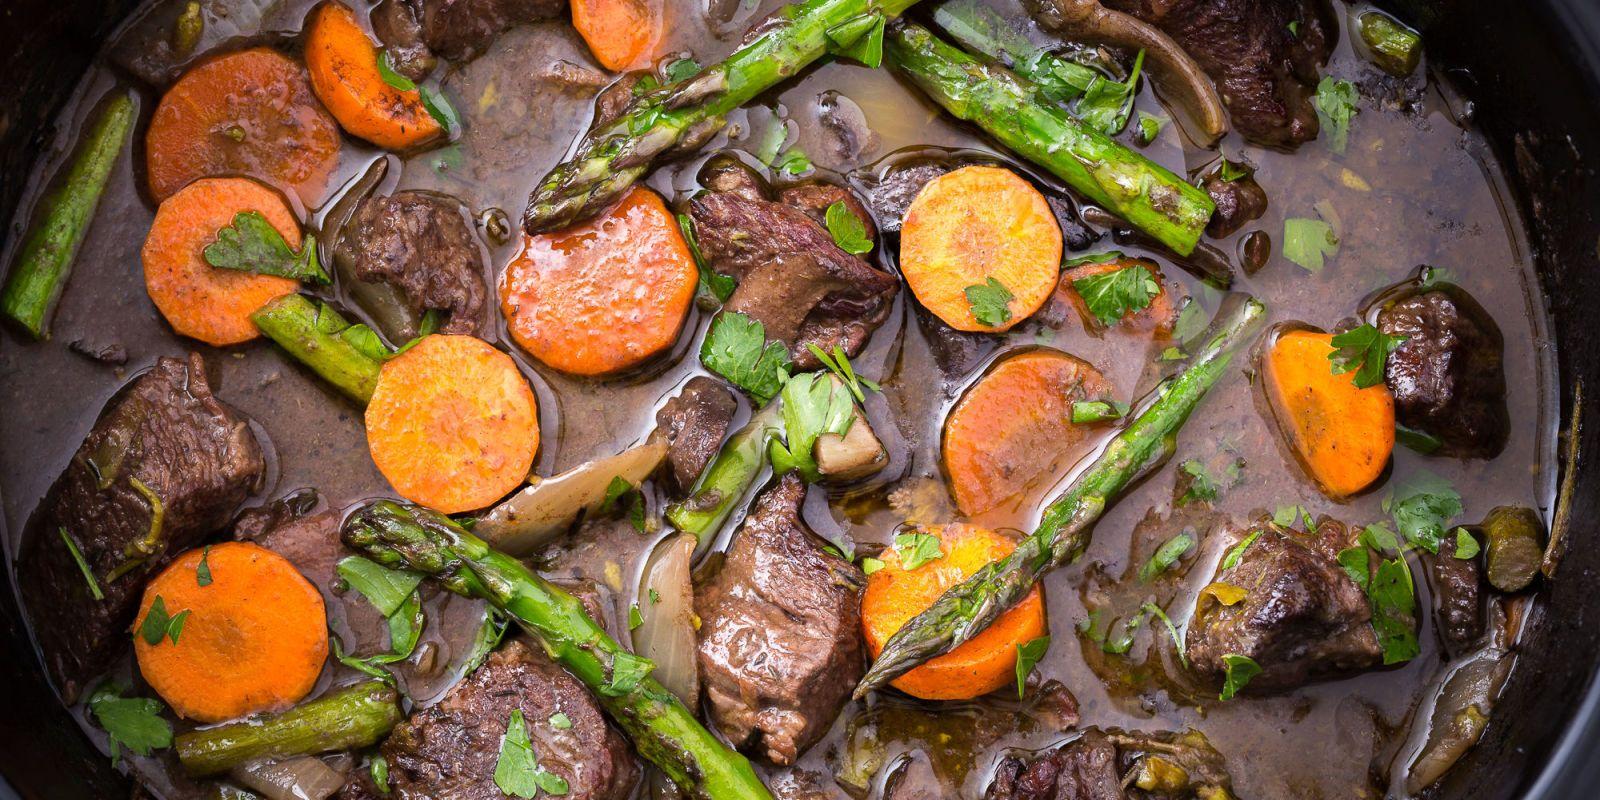 Slow Cooker Spring Beef Bourguignon Recipe Beef Bourguignon Beef Recipes Slow Cooker Dinner